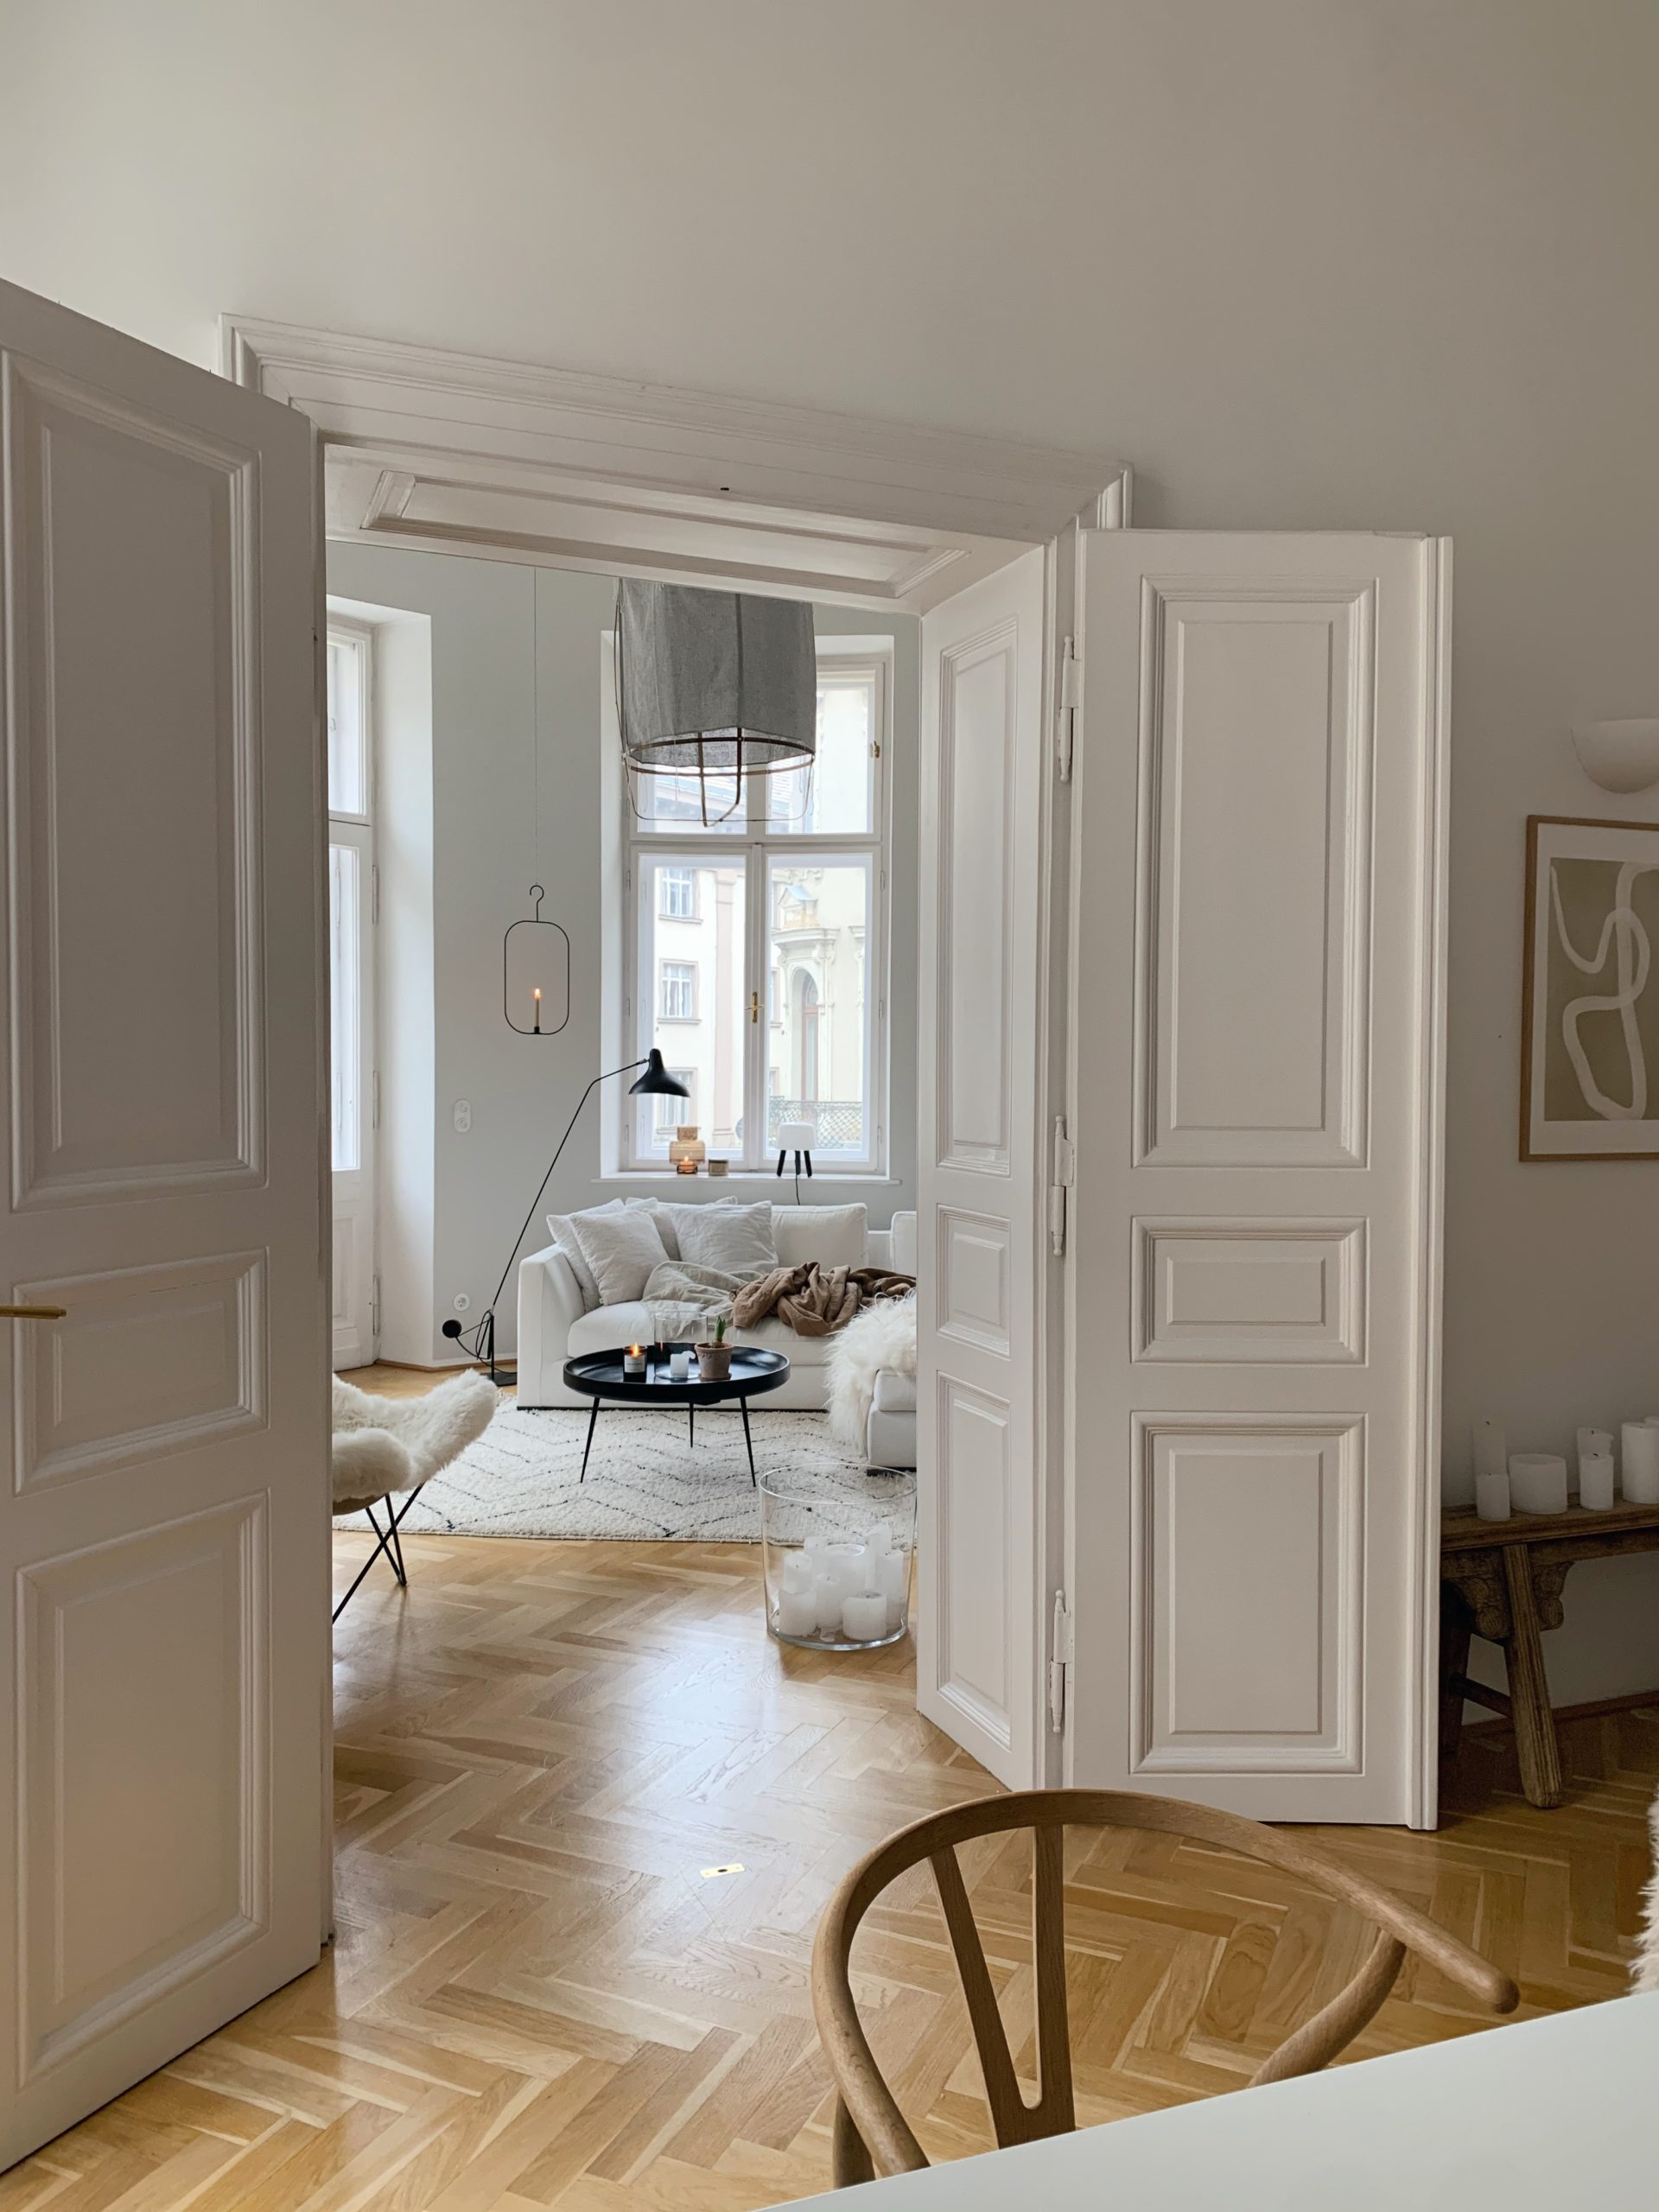 Homestory: Zu Besuch in Wien bei Svenja Brückner